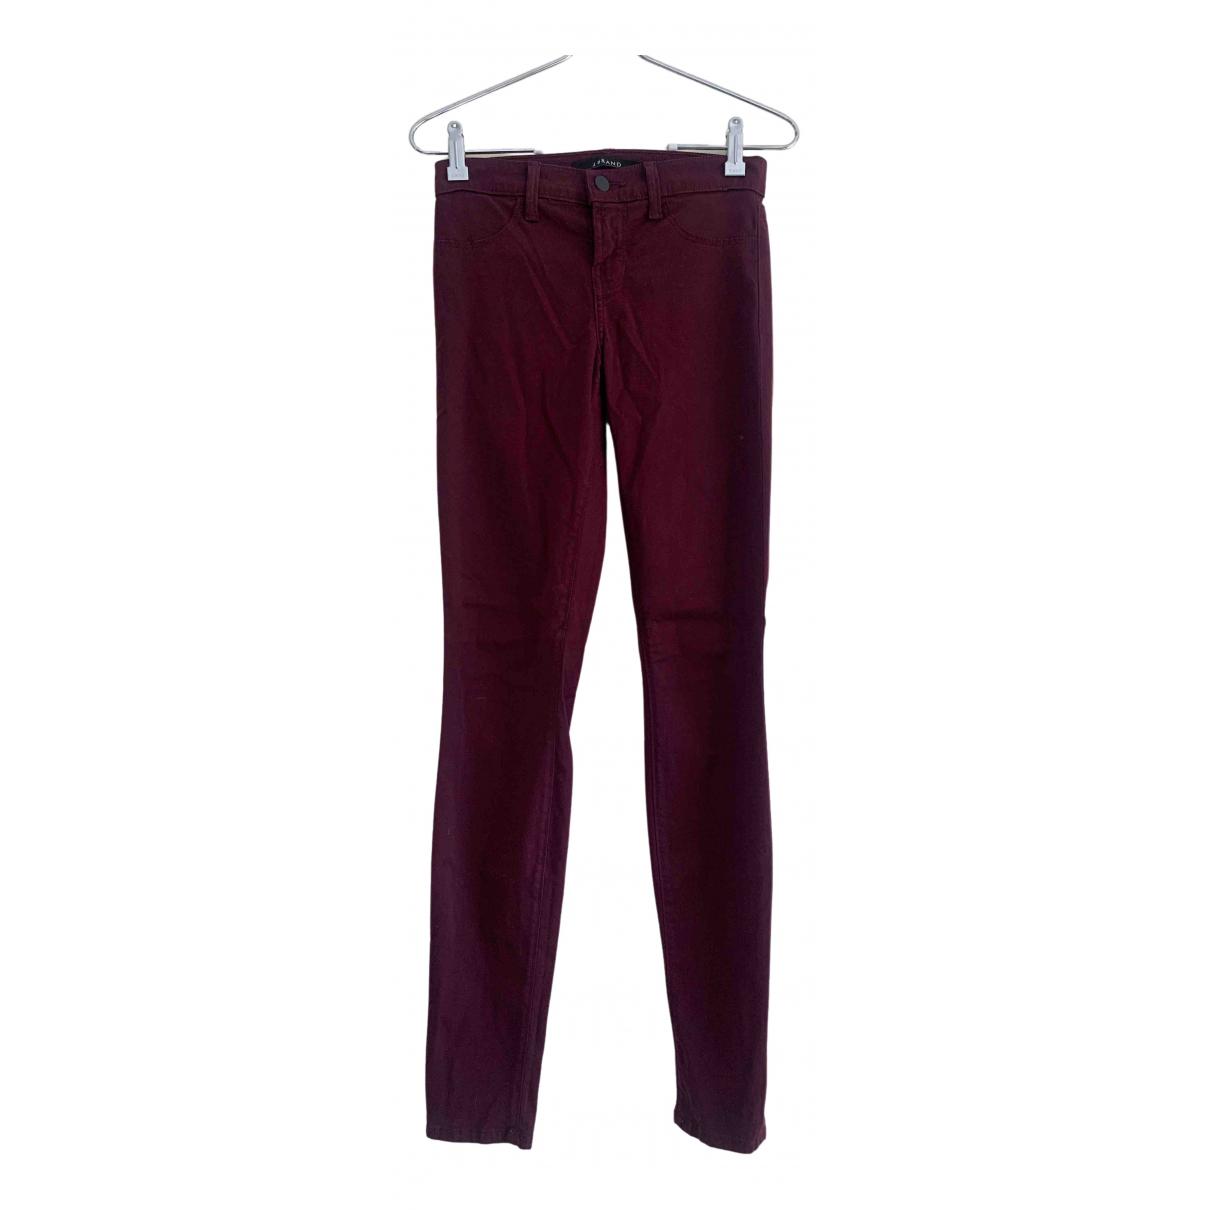 J Brand \N Burgundy Cotton - elasthane Jeans for Women 24 US